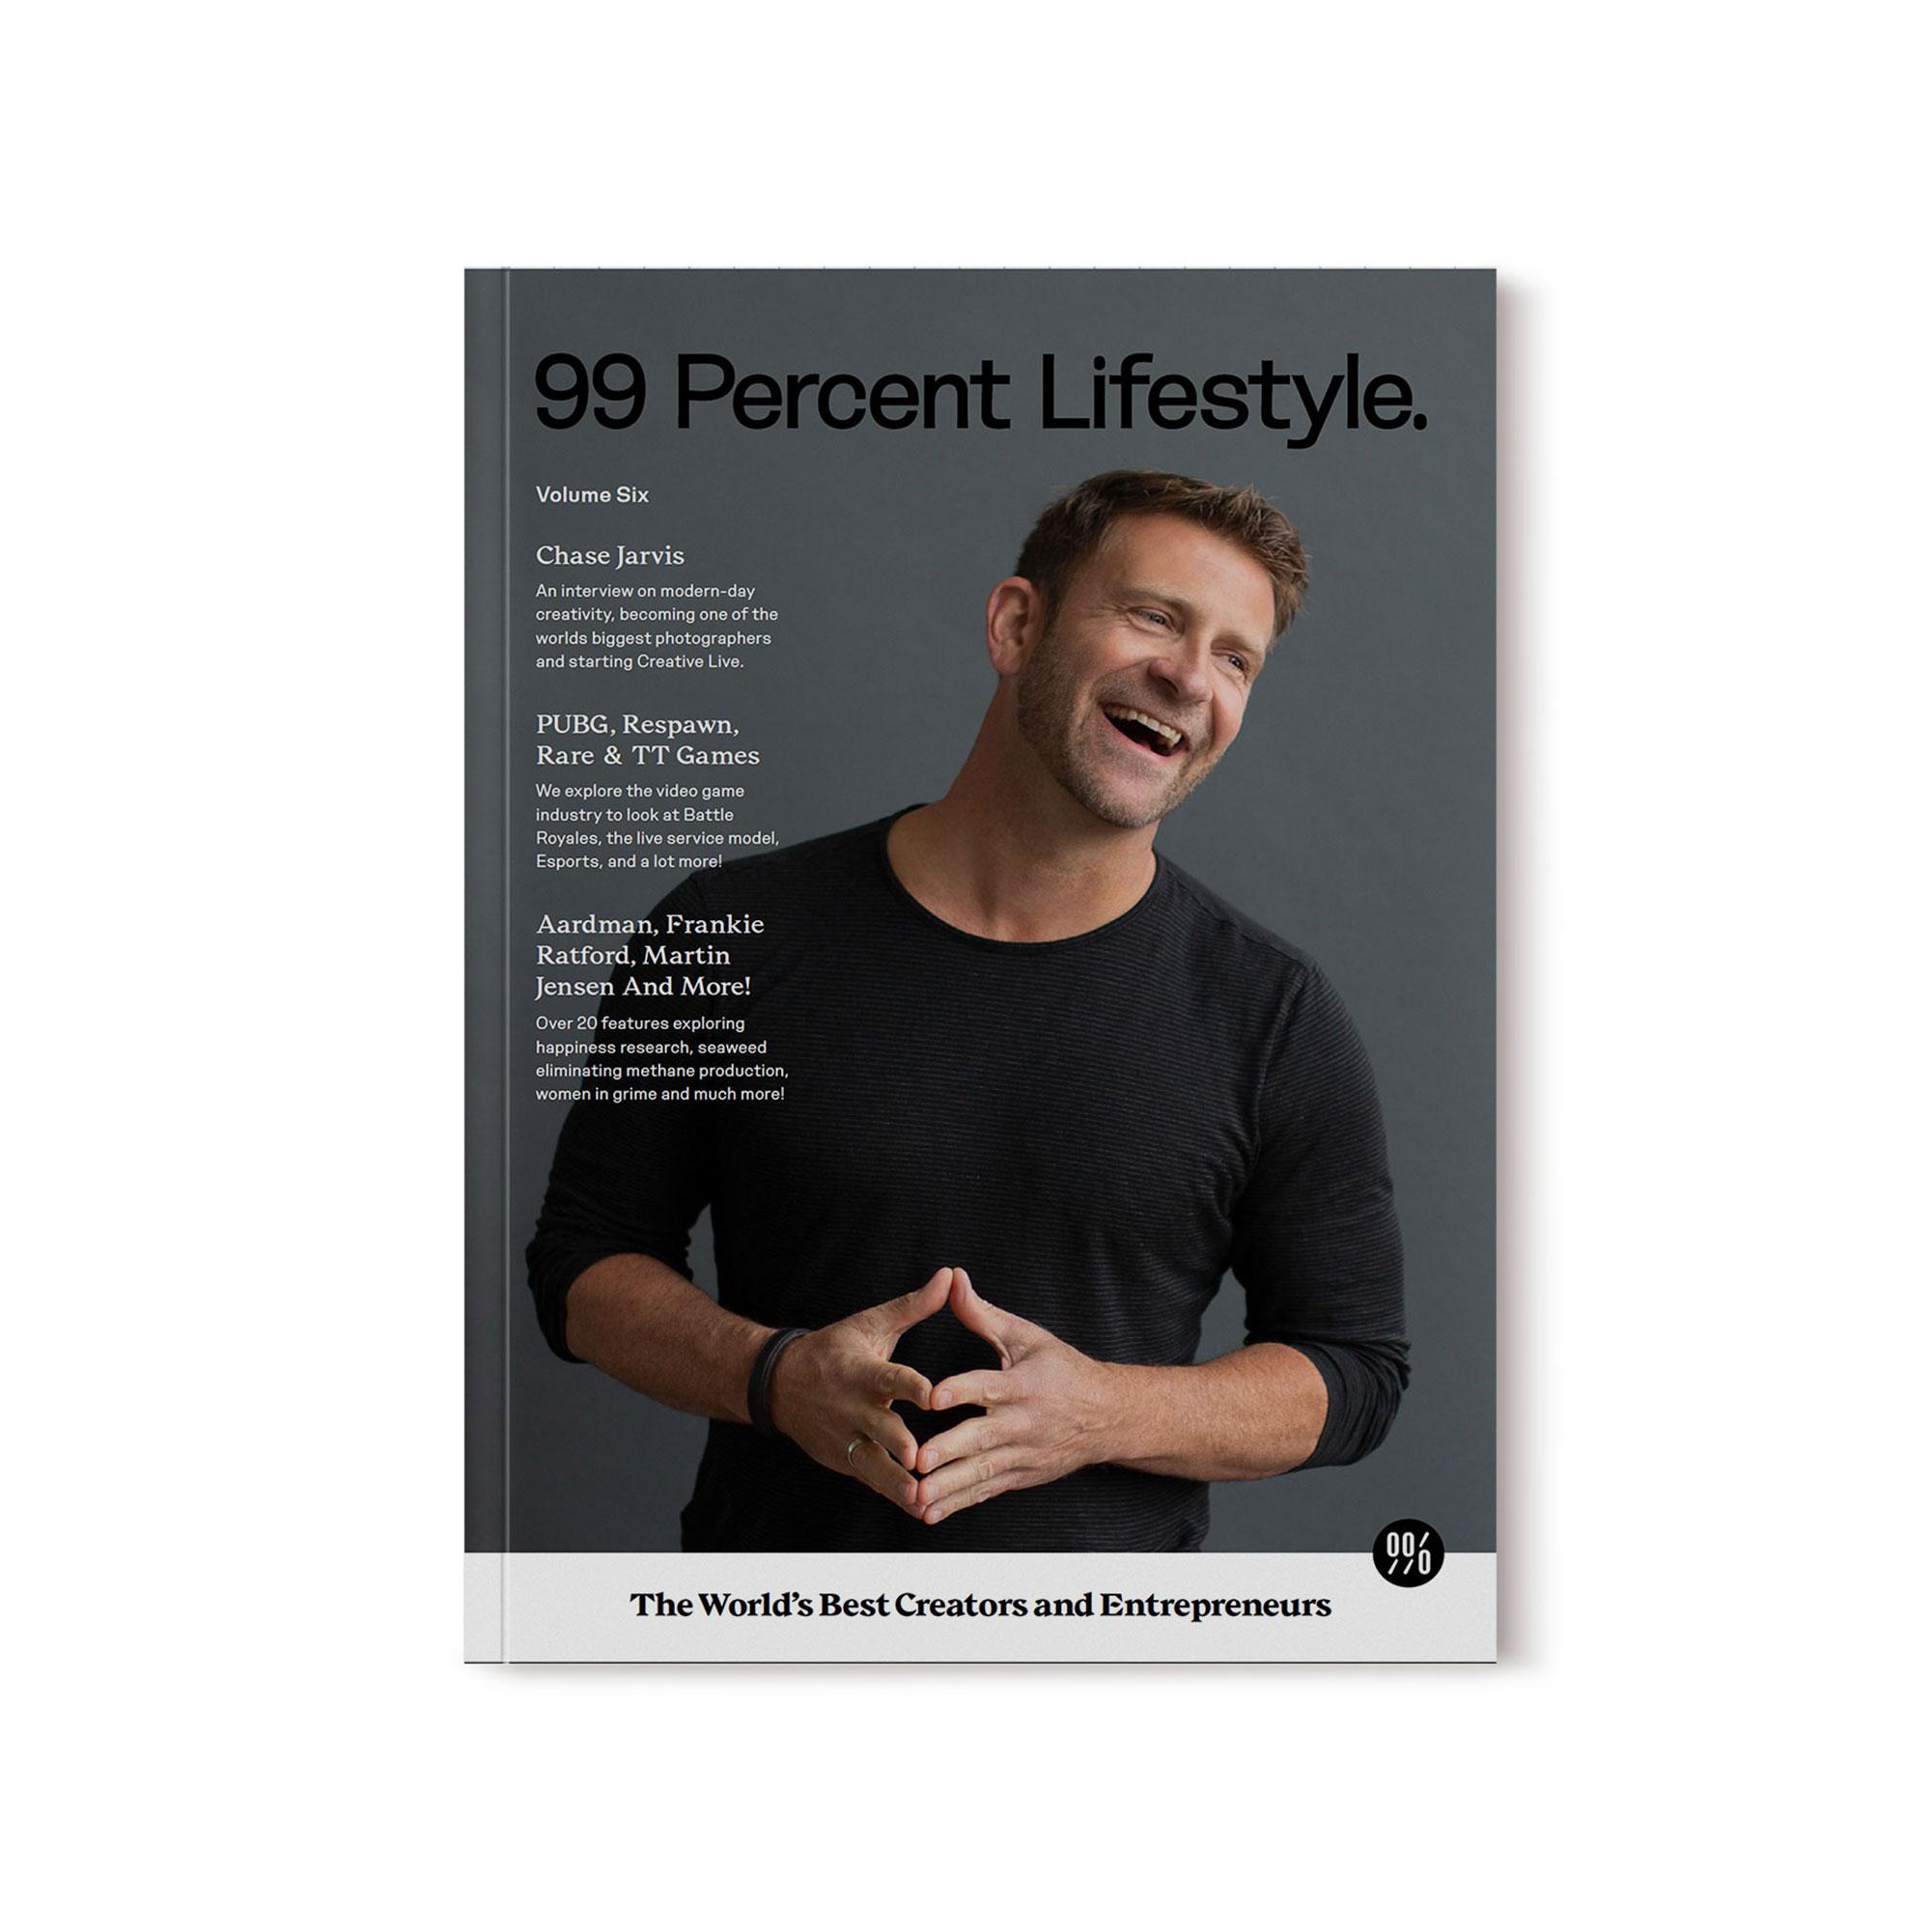 99 Percent Lifestyle Volume 6